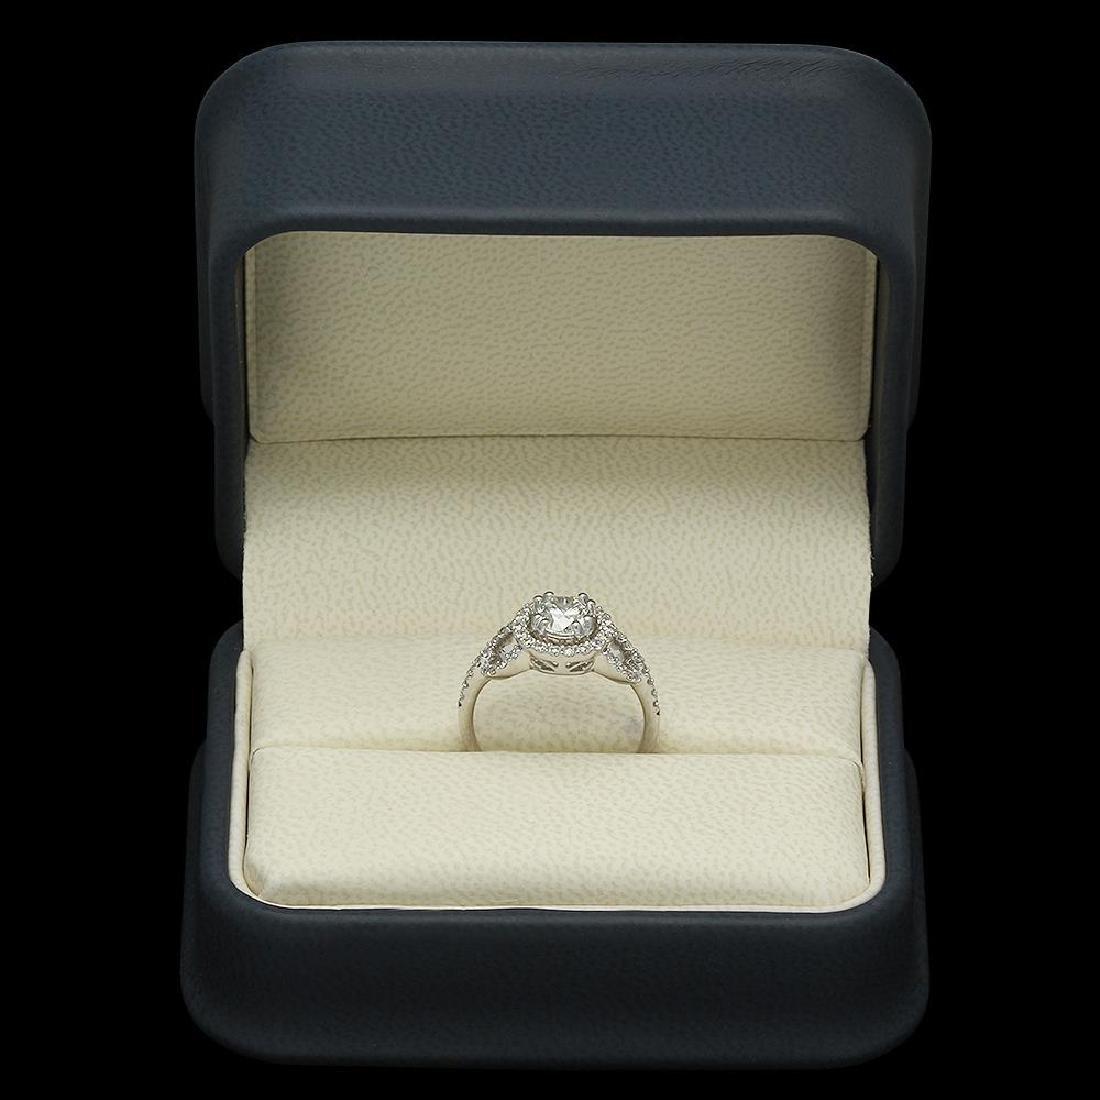 14K Gold 1.44ct Diamond Ring - 4